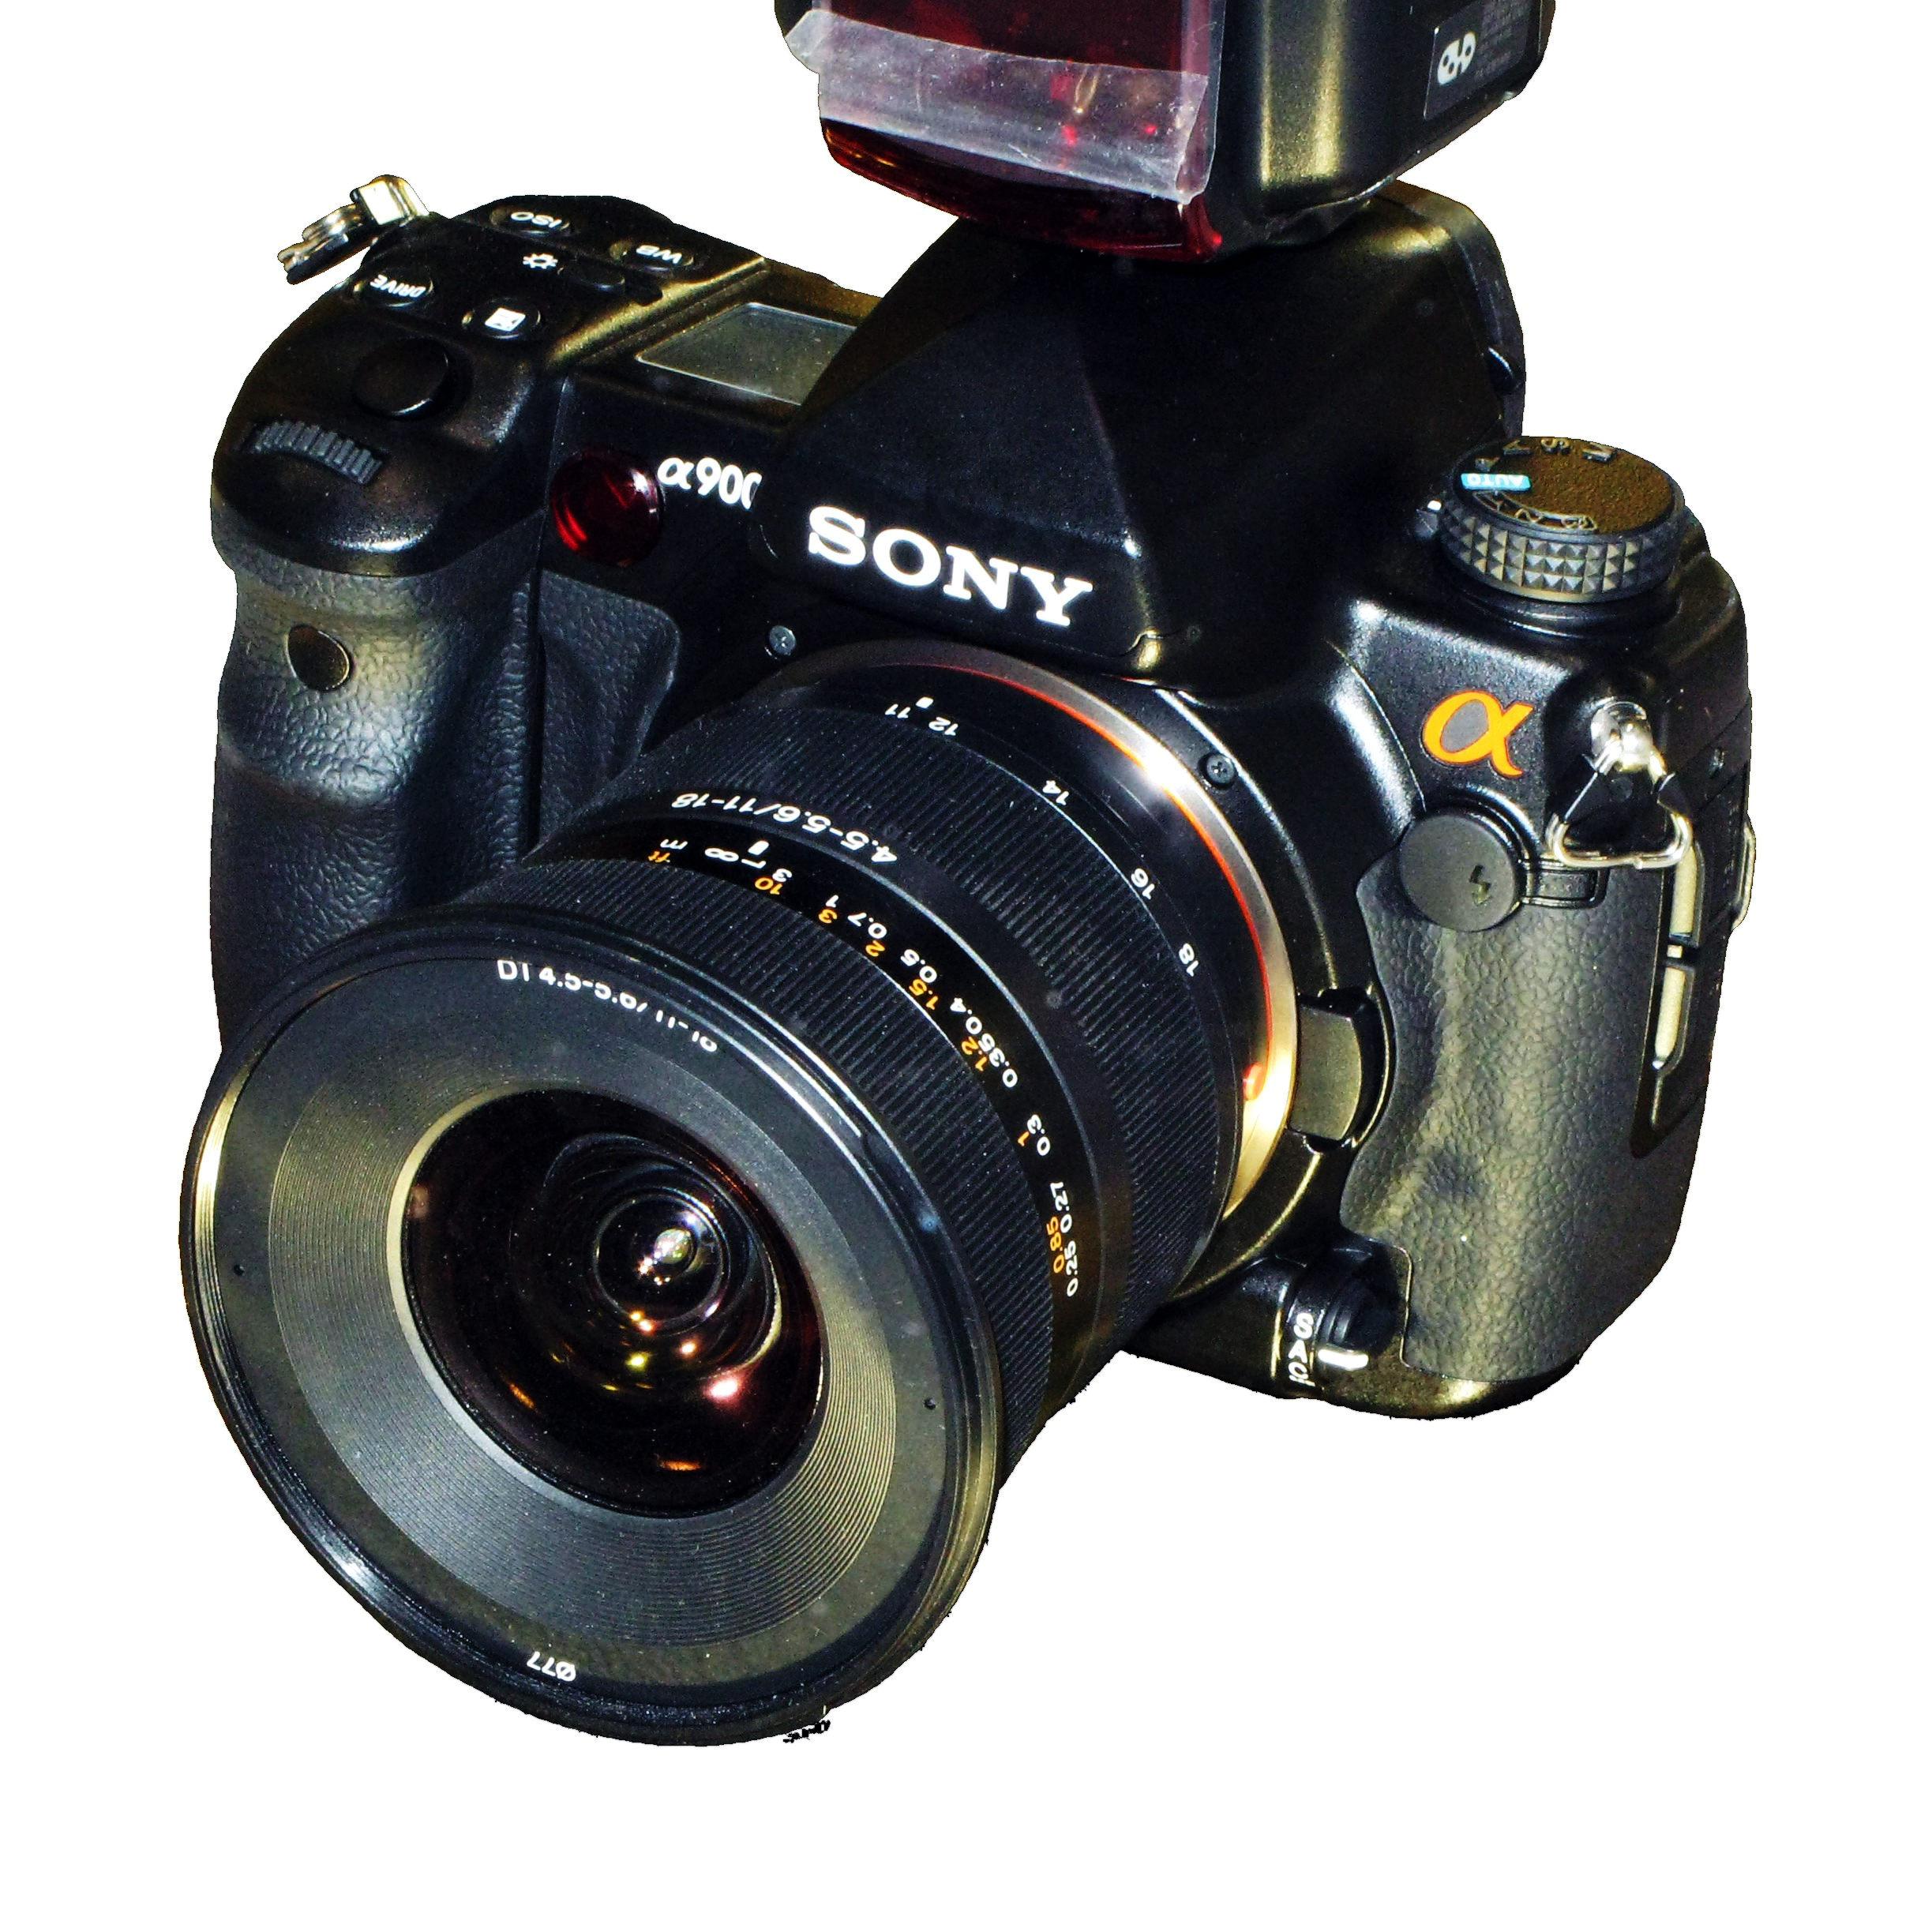 File:Sony alpha 900 IMG 2198.jpg